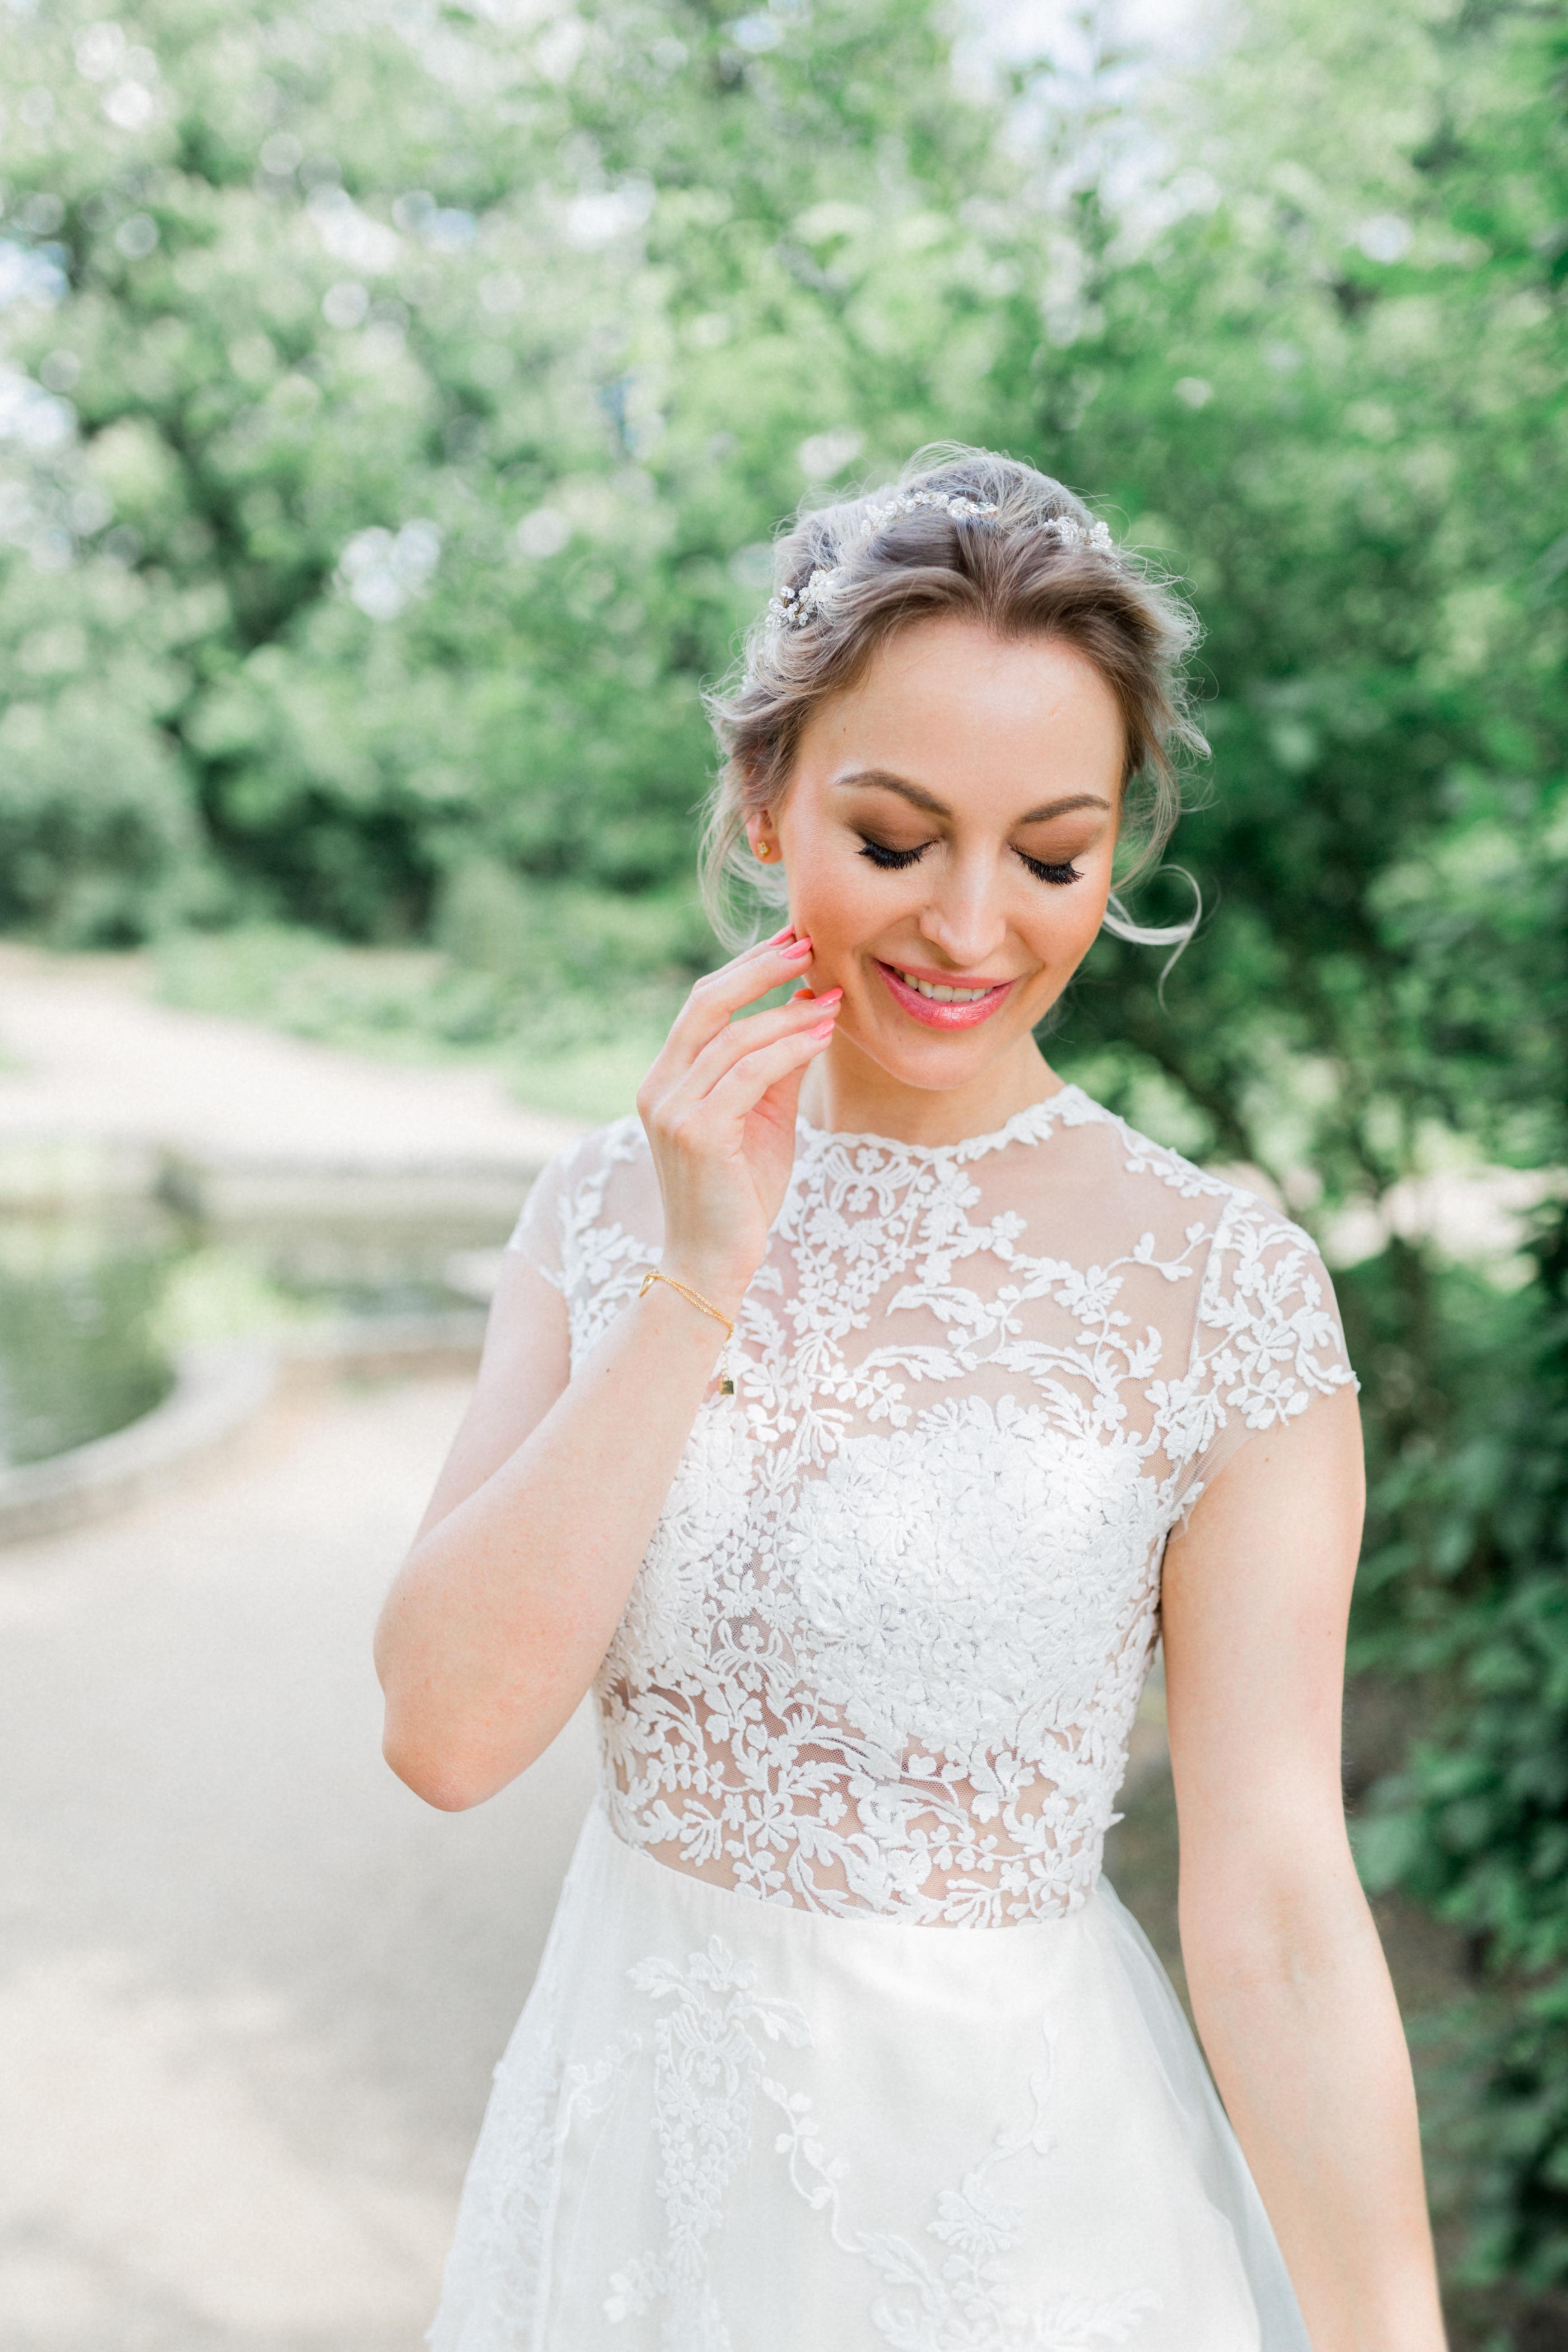 profesionelles makeup Hochzeit